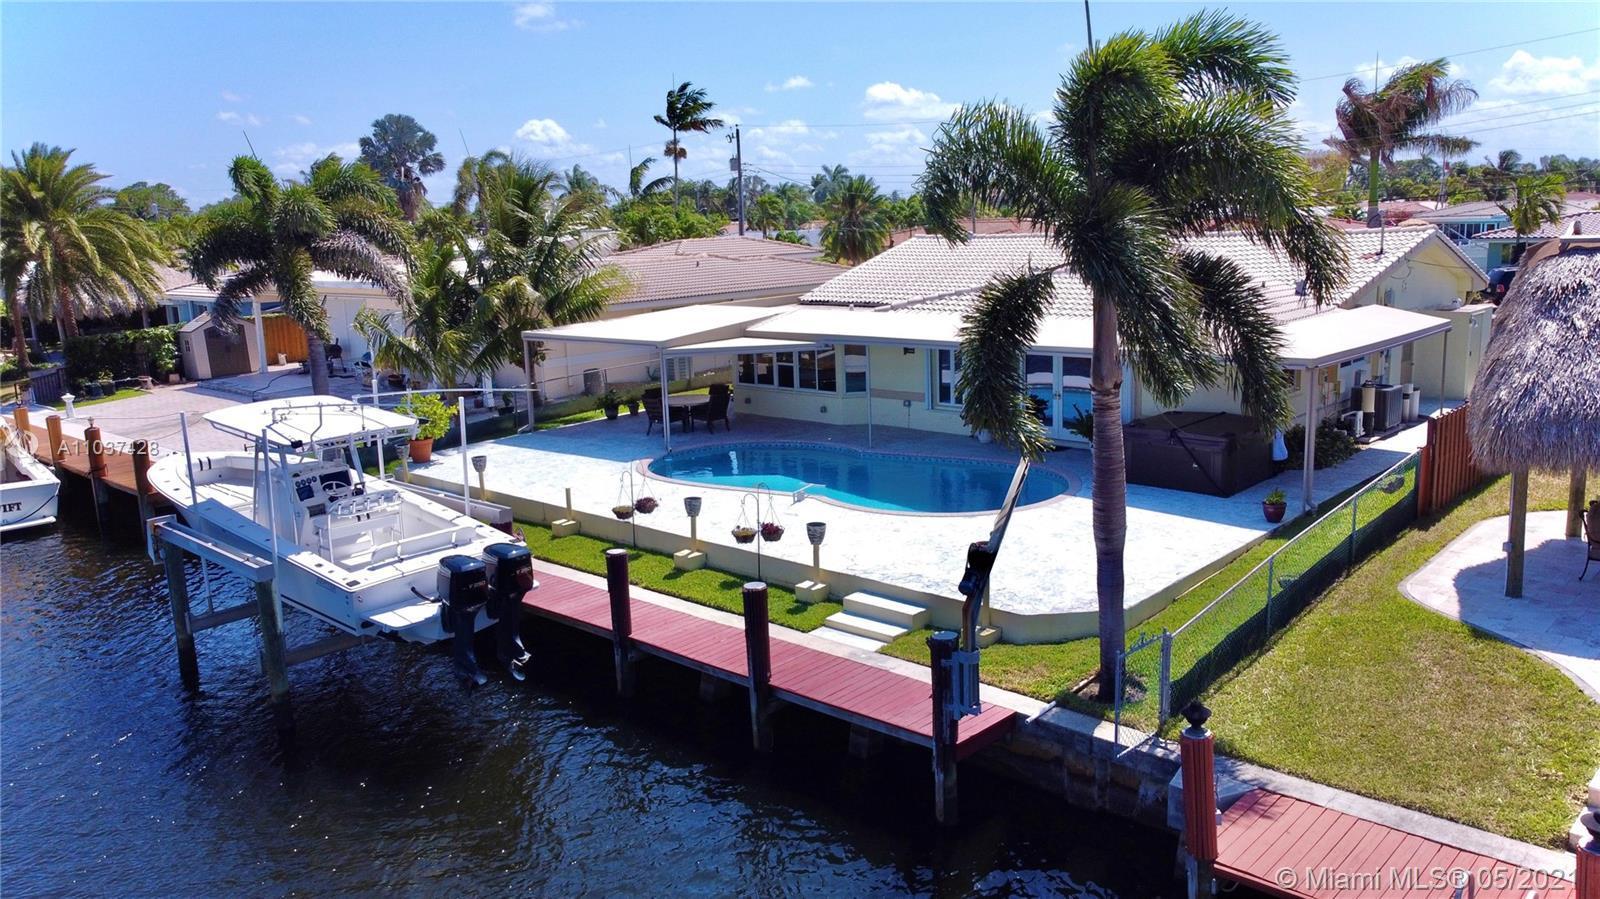 South Florida's Prime Ocean access 15 min to Ocean , Deep Water Canal dream home, won't last long. W